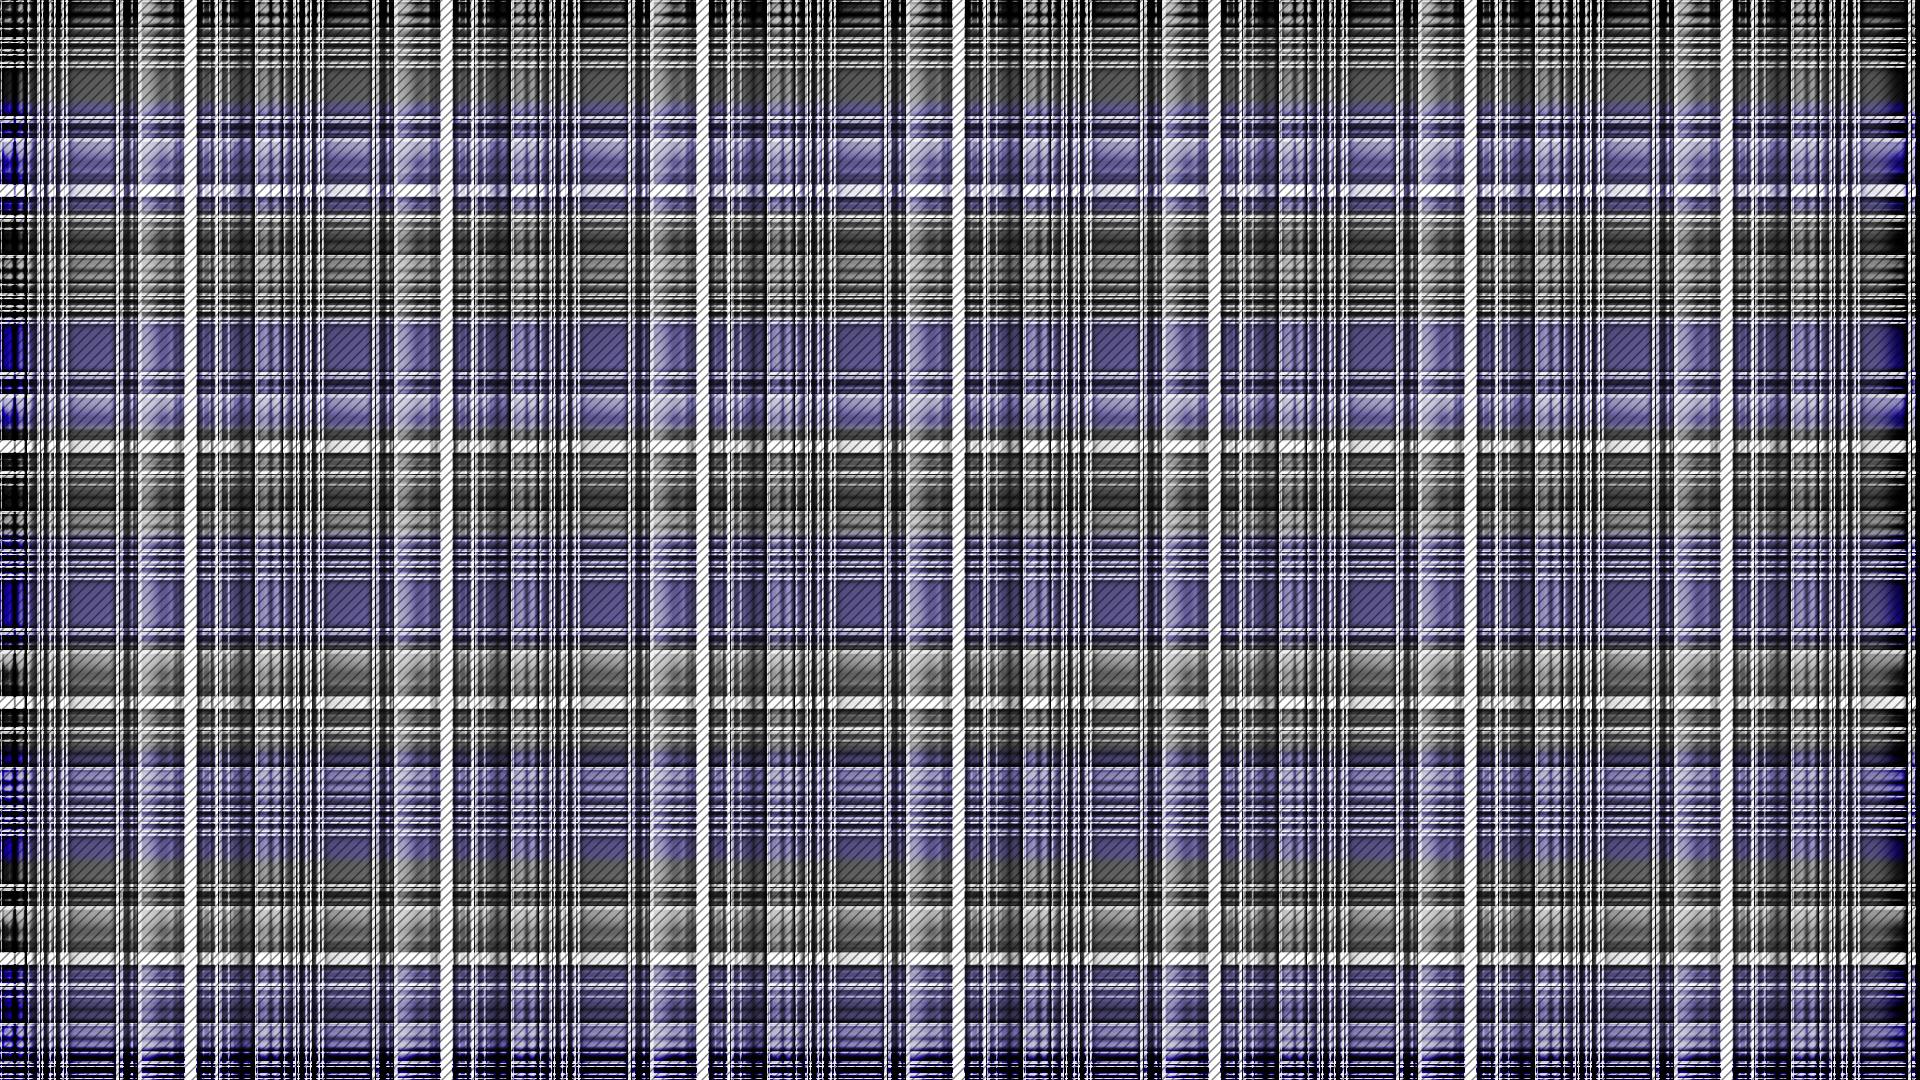 Purple grey plaid wallpaper by lateralus138 on deviantart for Grey tartan wallpaper